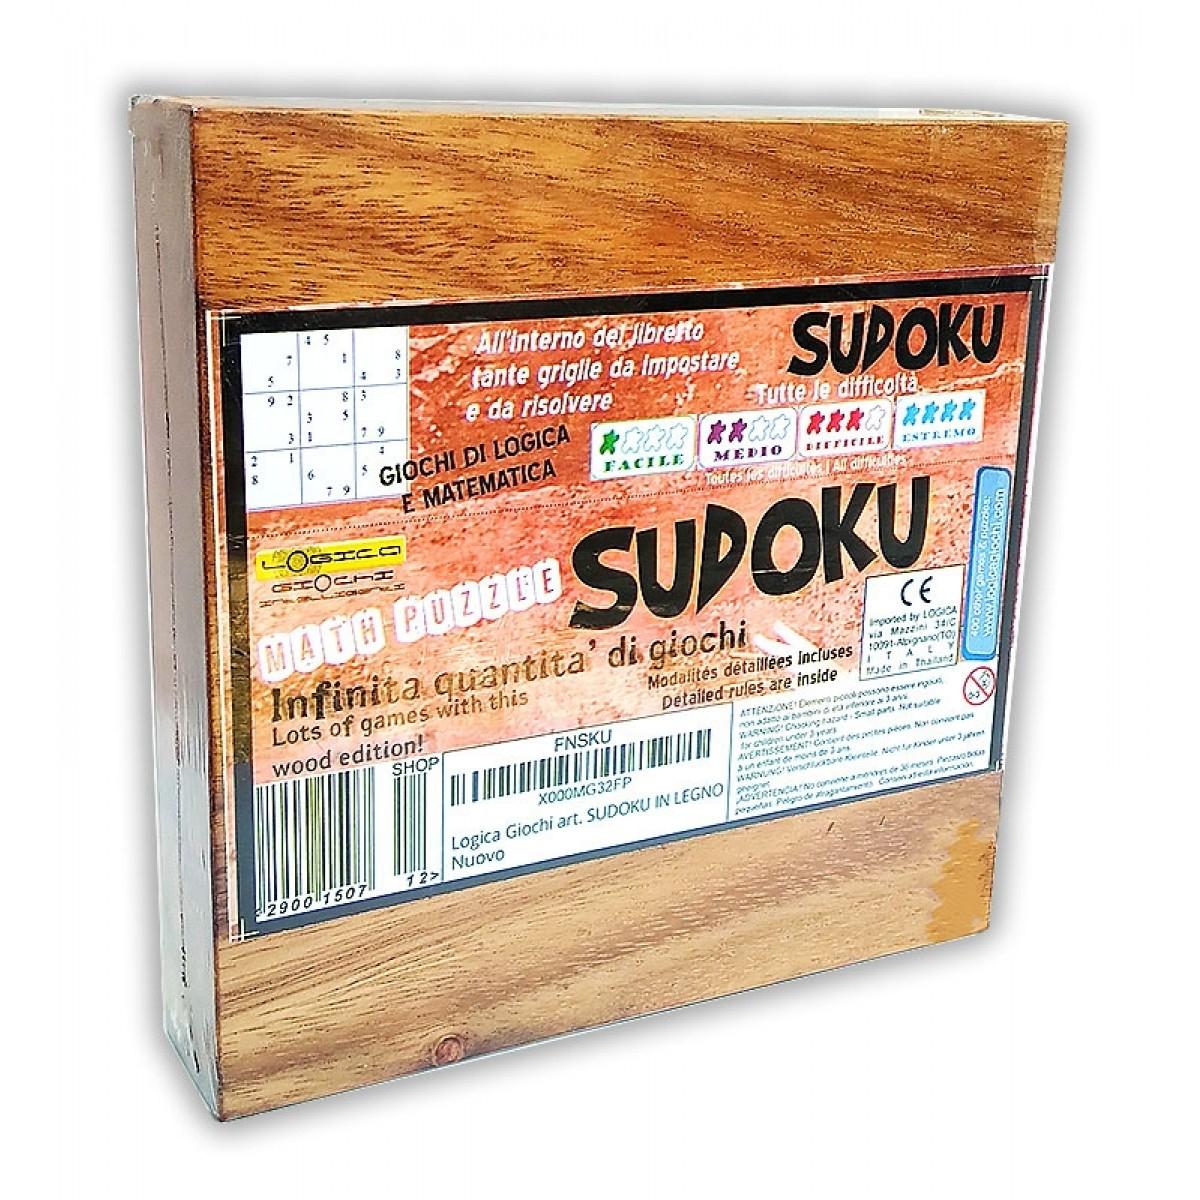 Sudoku pour Sudoku Facile Avec Solution